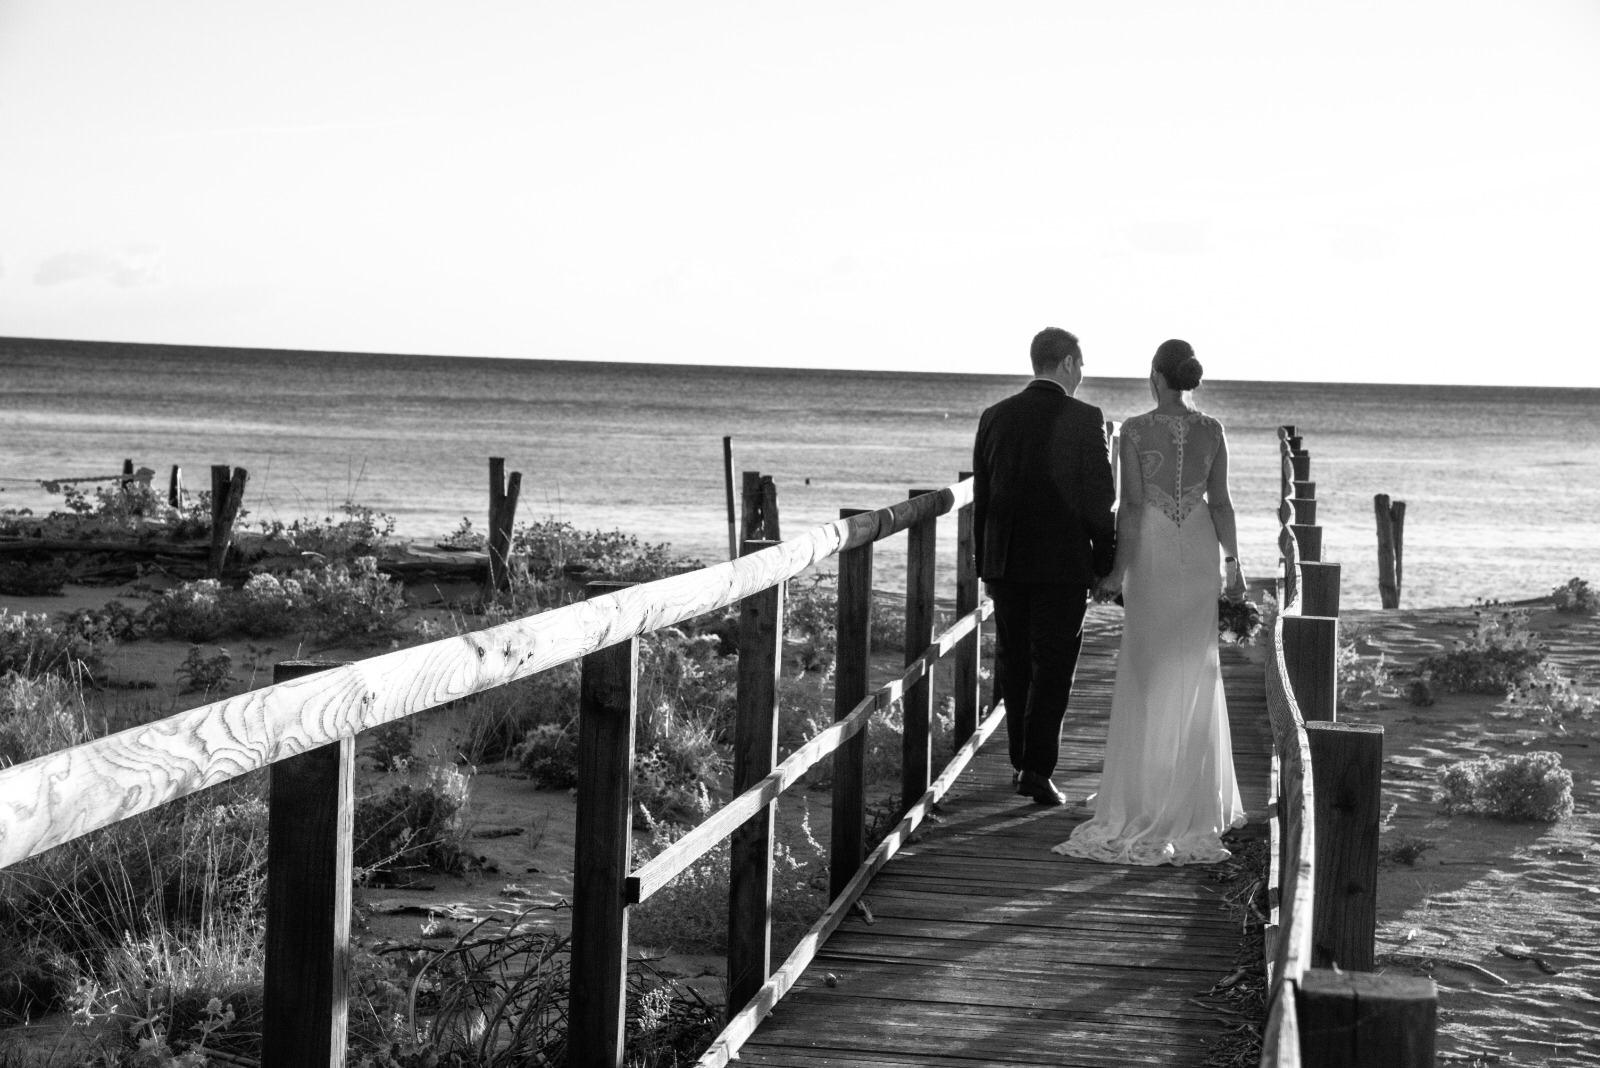 http://www.weddingamalfi.com/wp-content/uploads/Simona-Pietro-wedding-in-Palinuro-Wedding-Amalfi-wedding-planner.jpeg